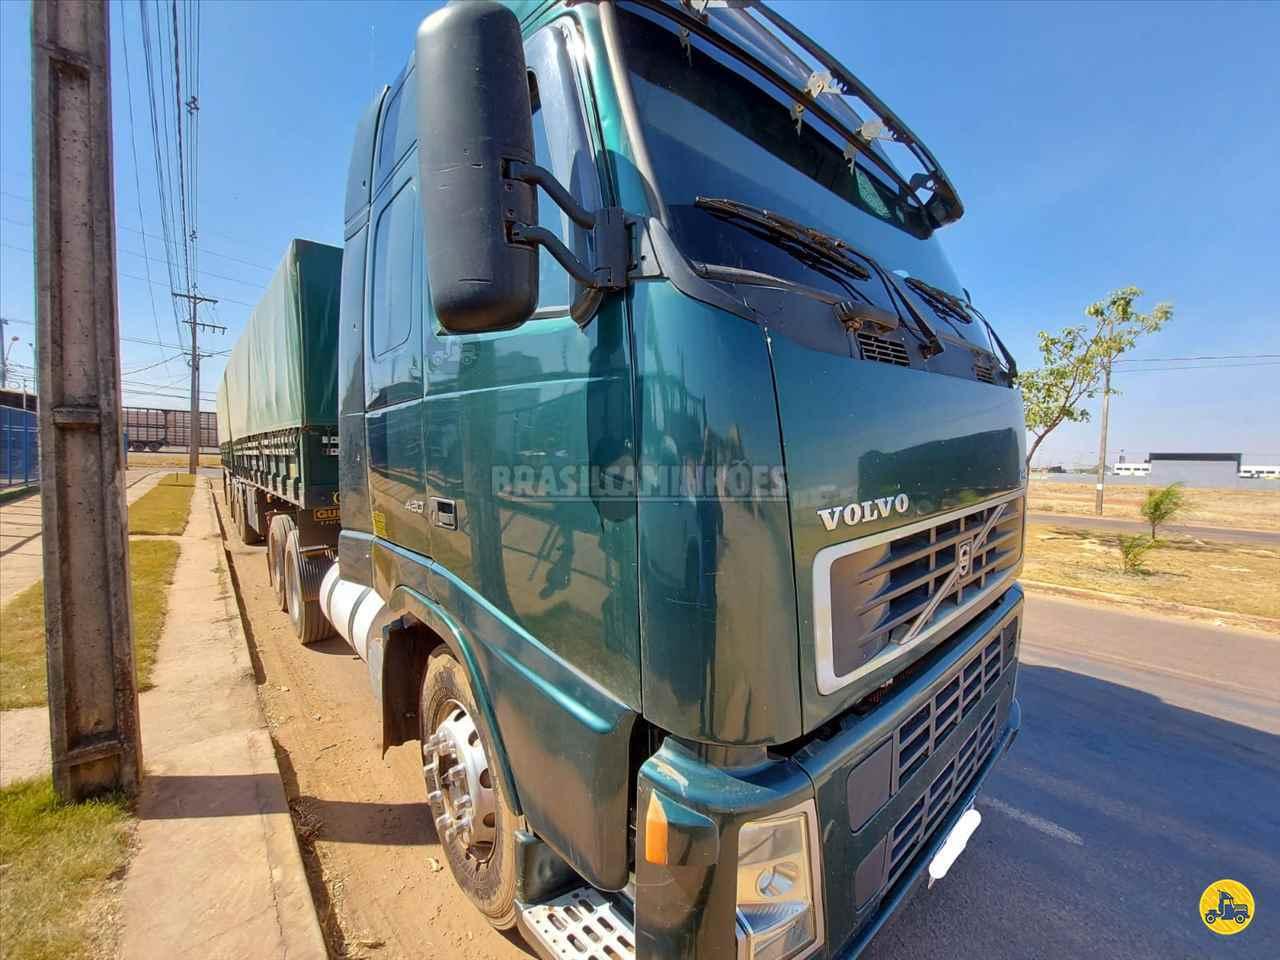 CAMINHAO VOLVO VOLVO FH 420 Graneleiro Truck 6x2 Brasil Caminhões Sinop SINOP MATO GROSSO MT